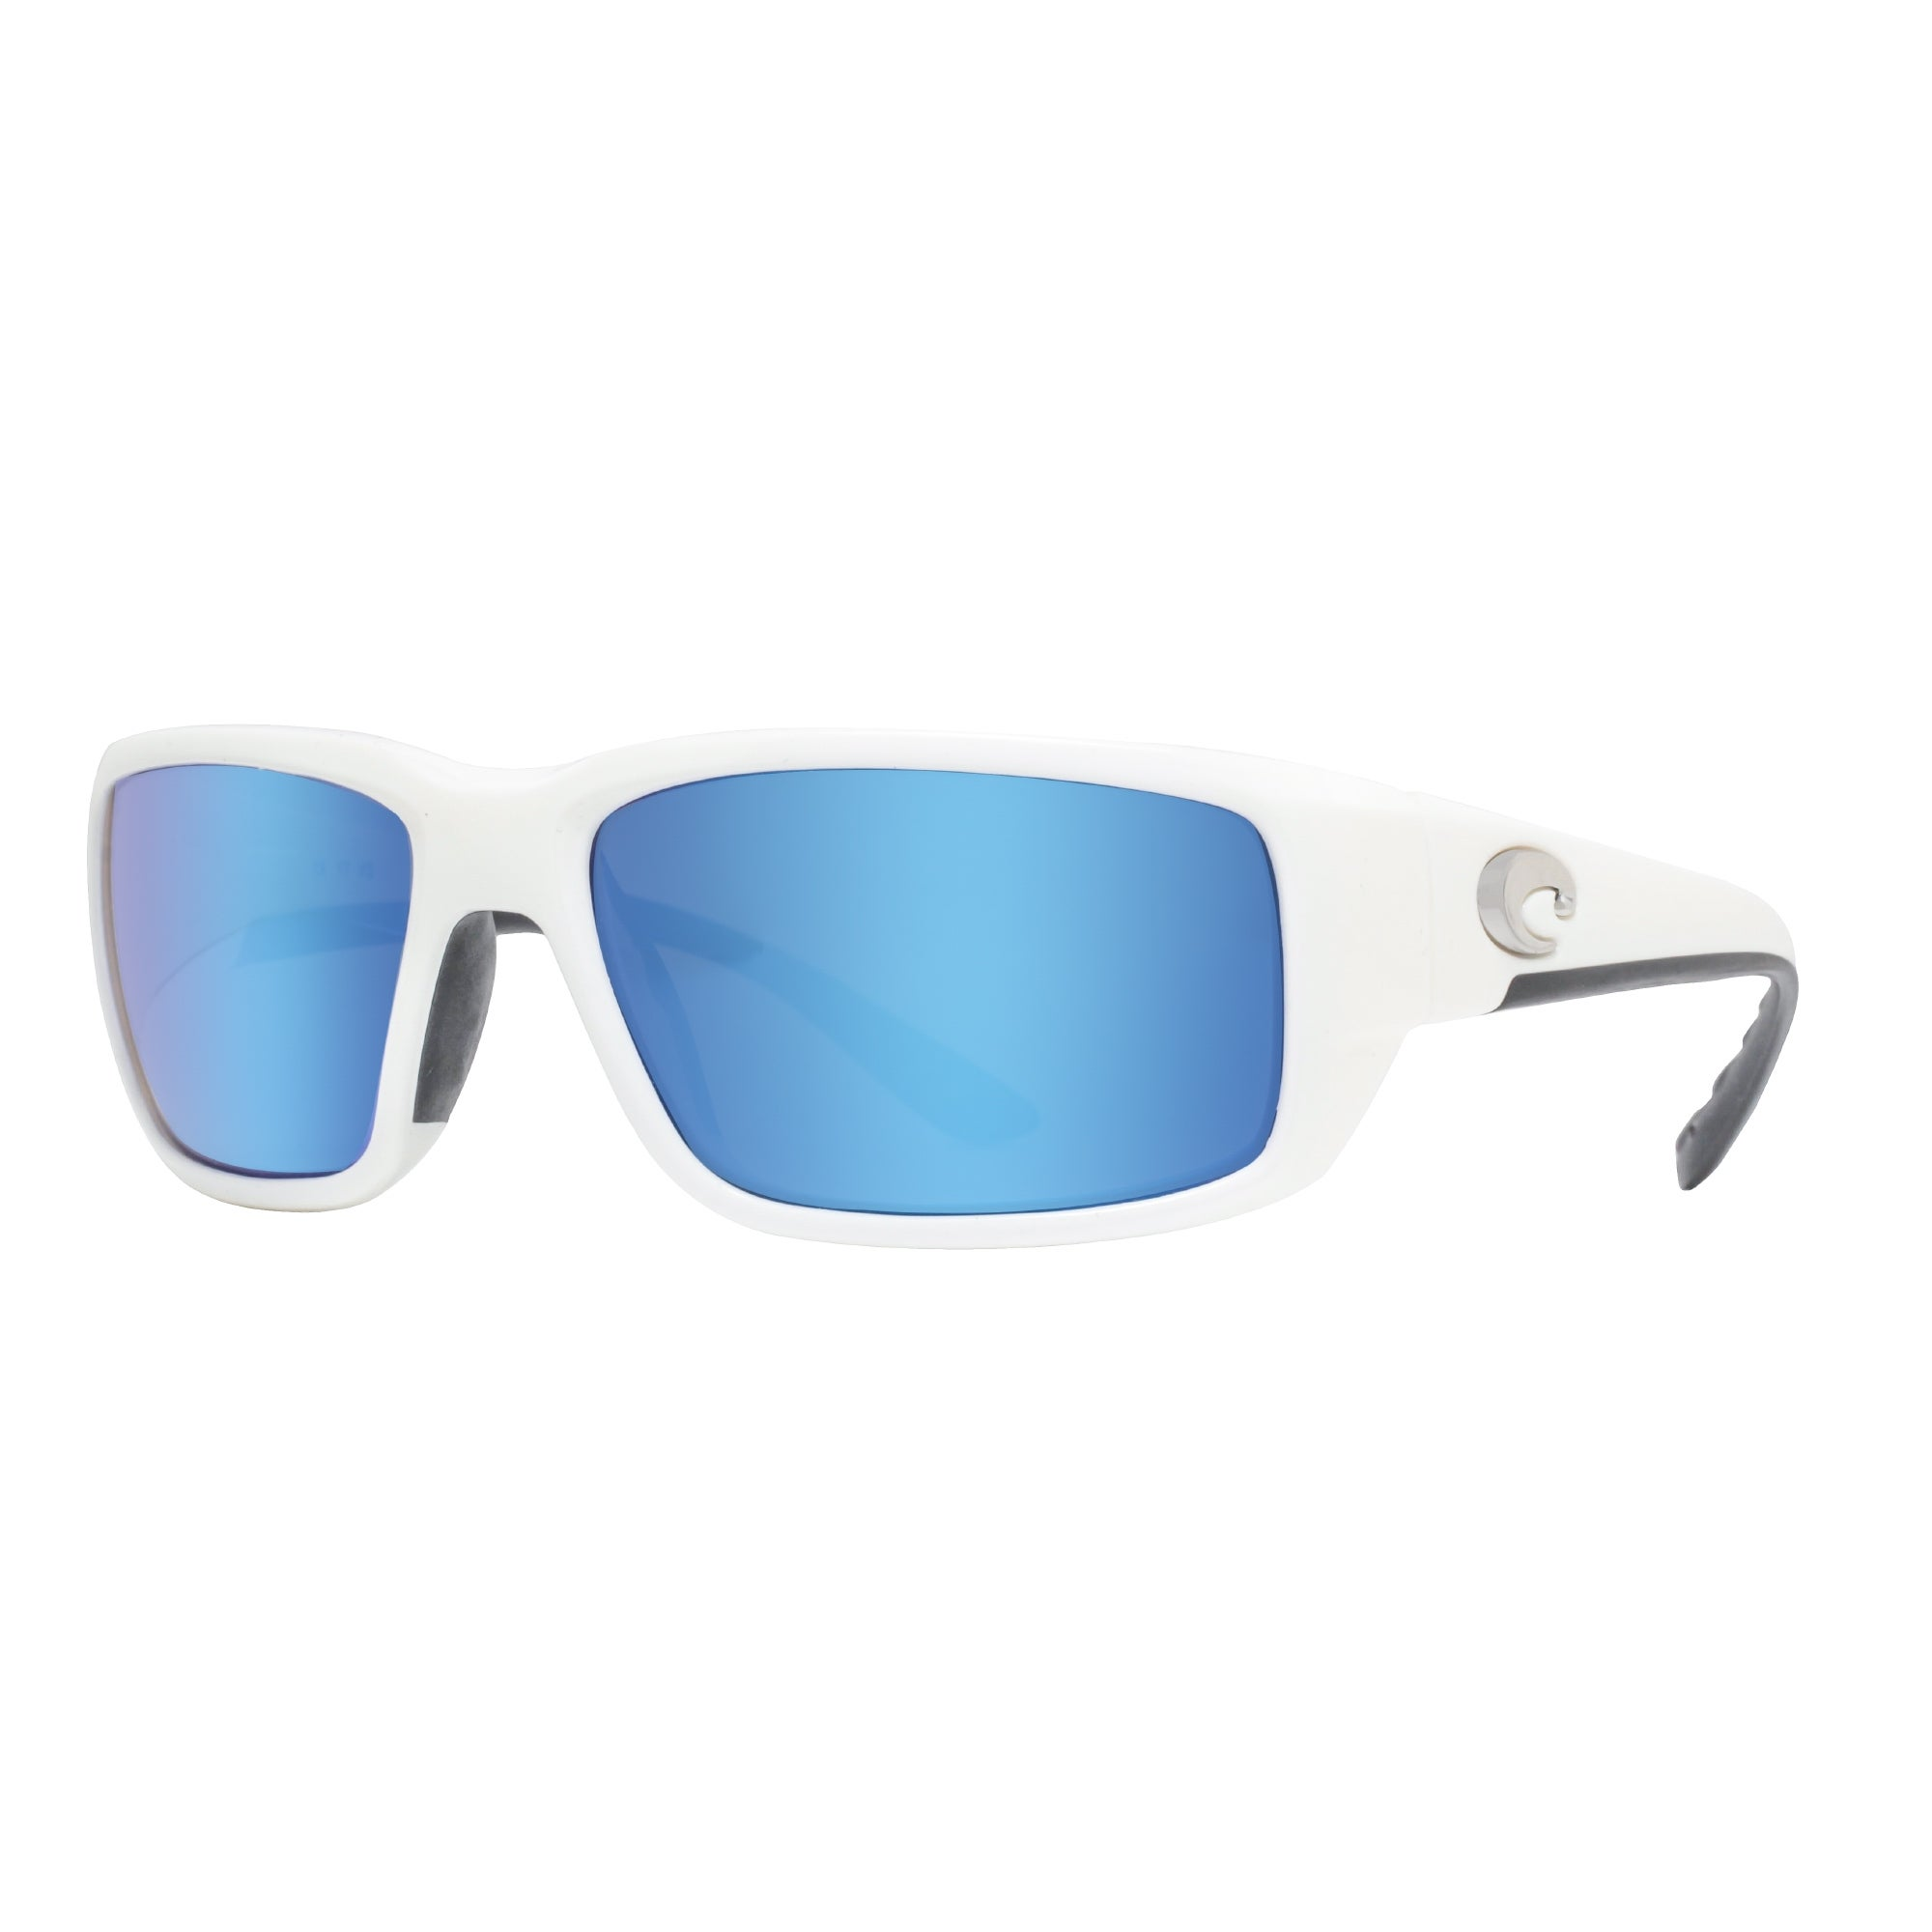 68cacdedb01 Costa Del Mar Fantail 580G White Blue Mirror Sunglasses TF25OBMGLP -  59mm-18mm-120mm